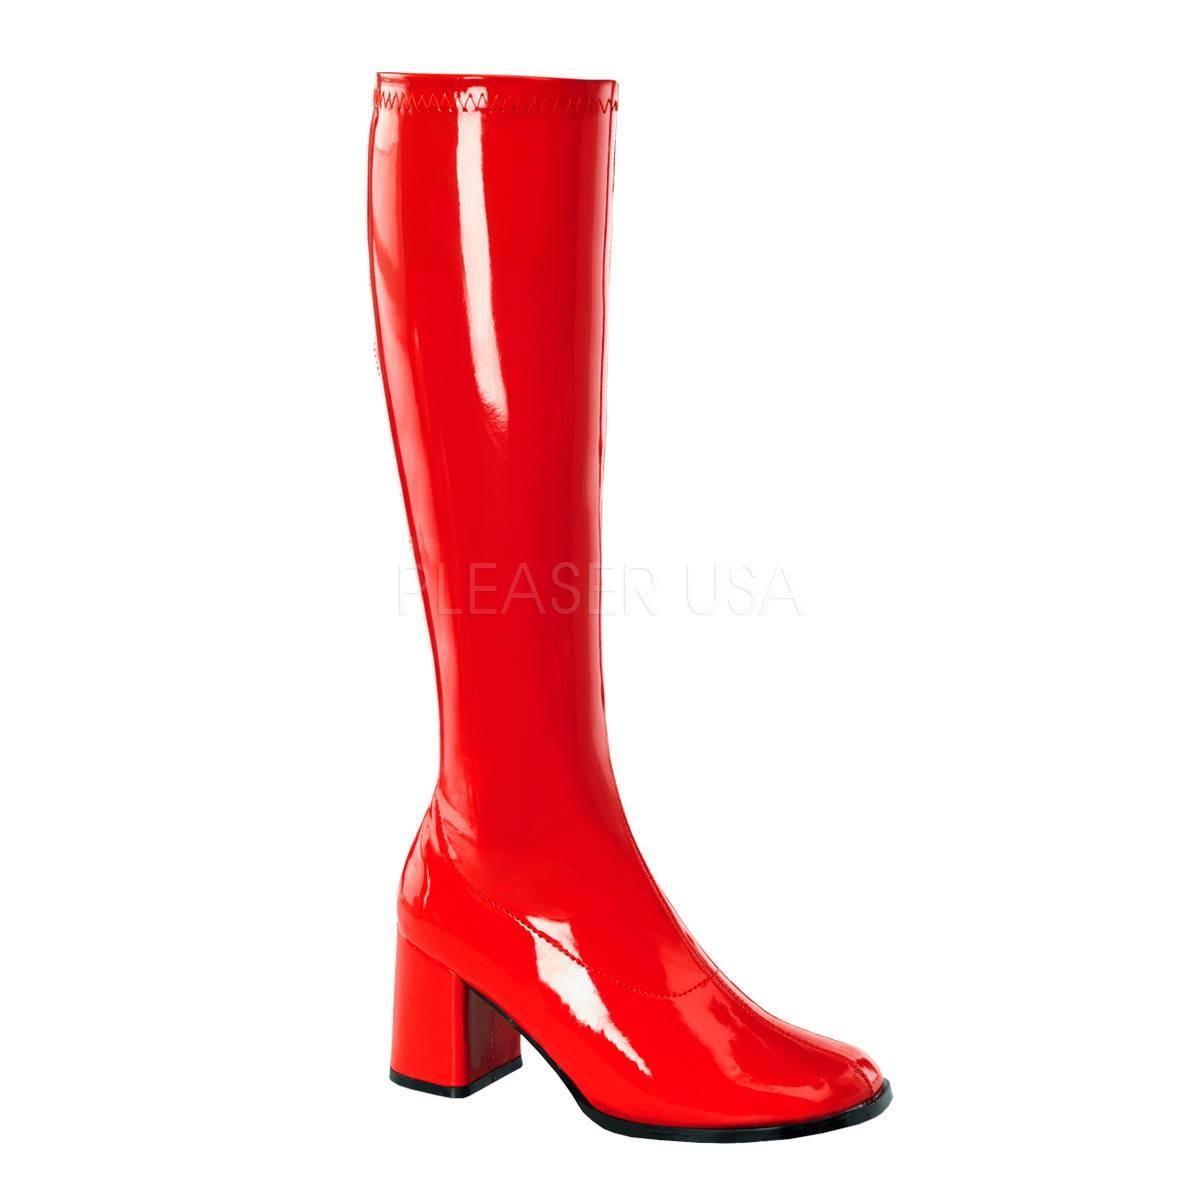 Stiefel - GOGO 300 ° Damen Stiefel ° Rot Glänzend ° Funtasma  - Onlineshop RedSixty